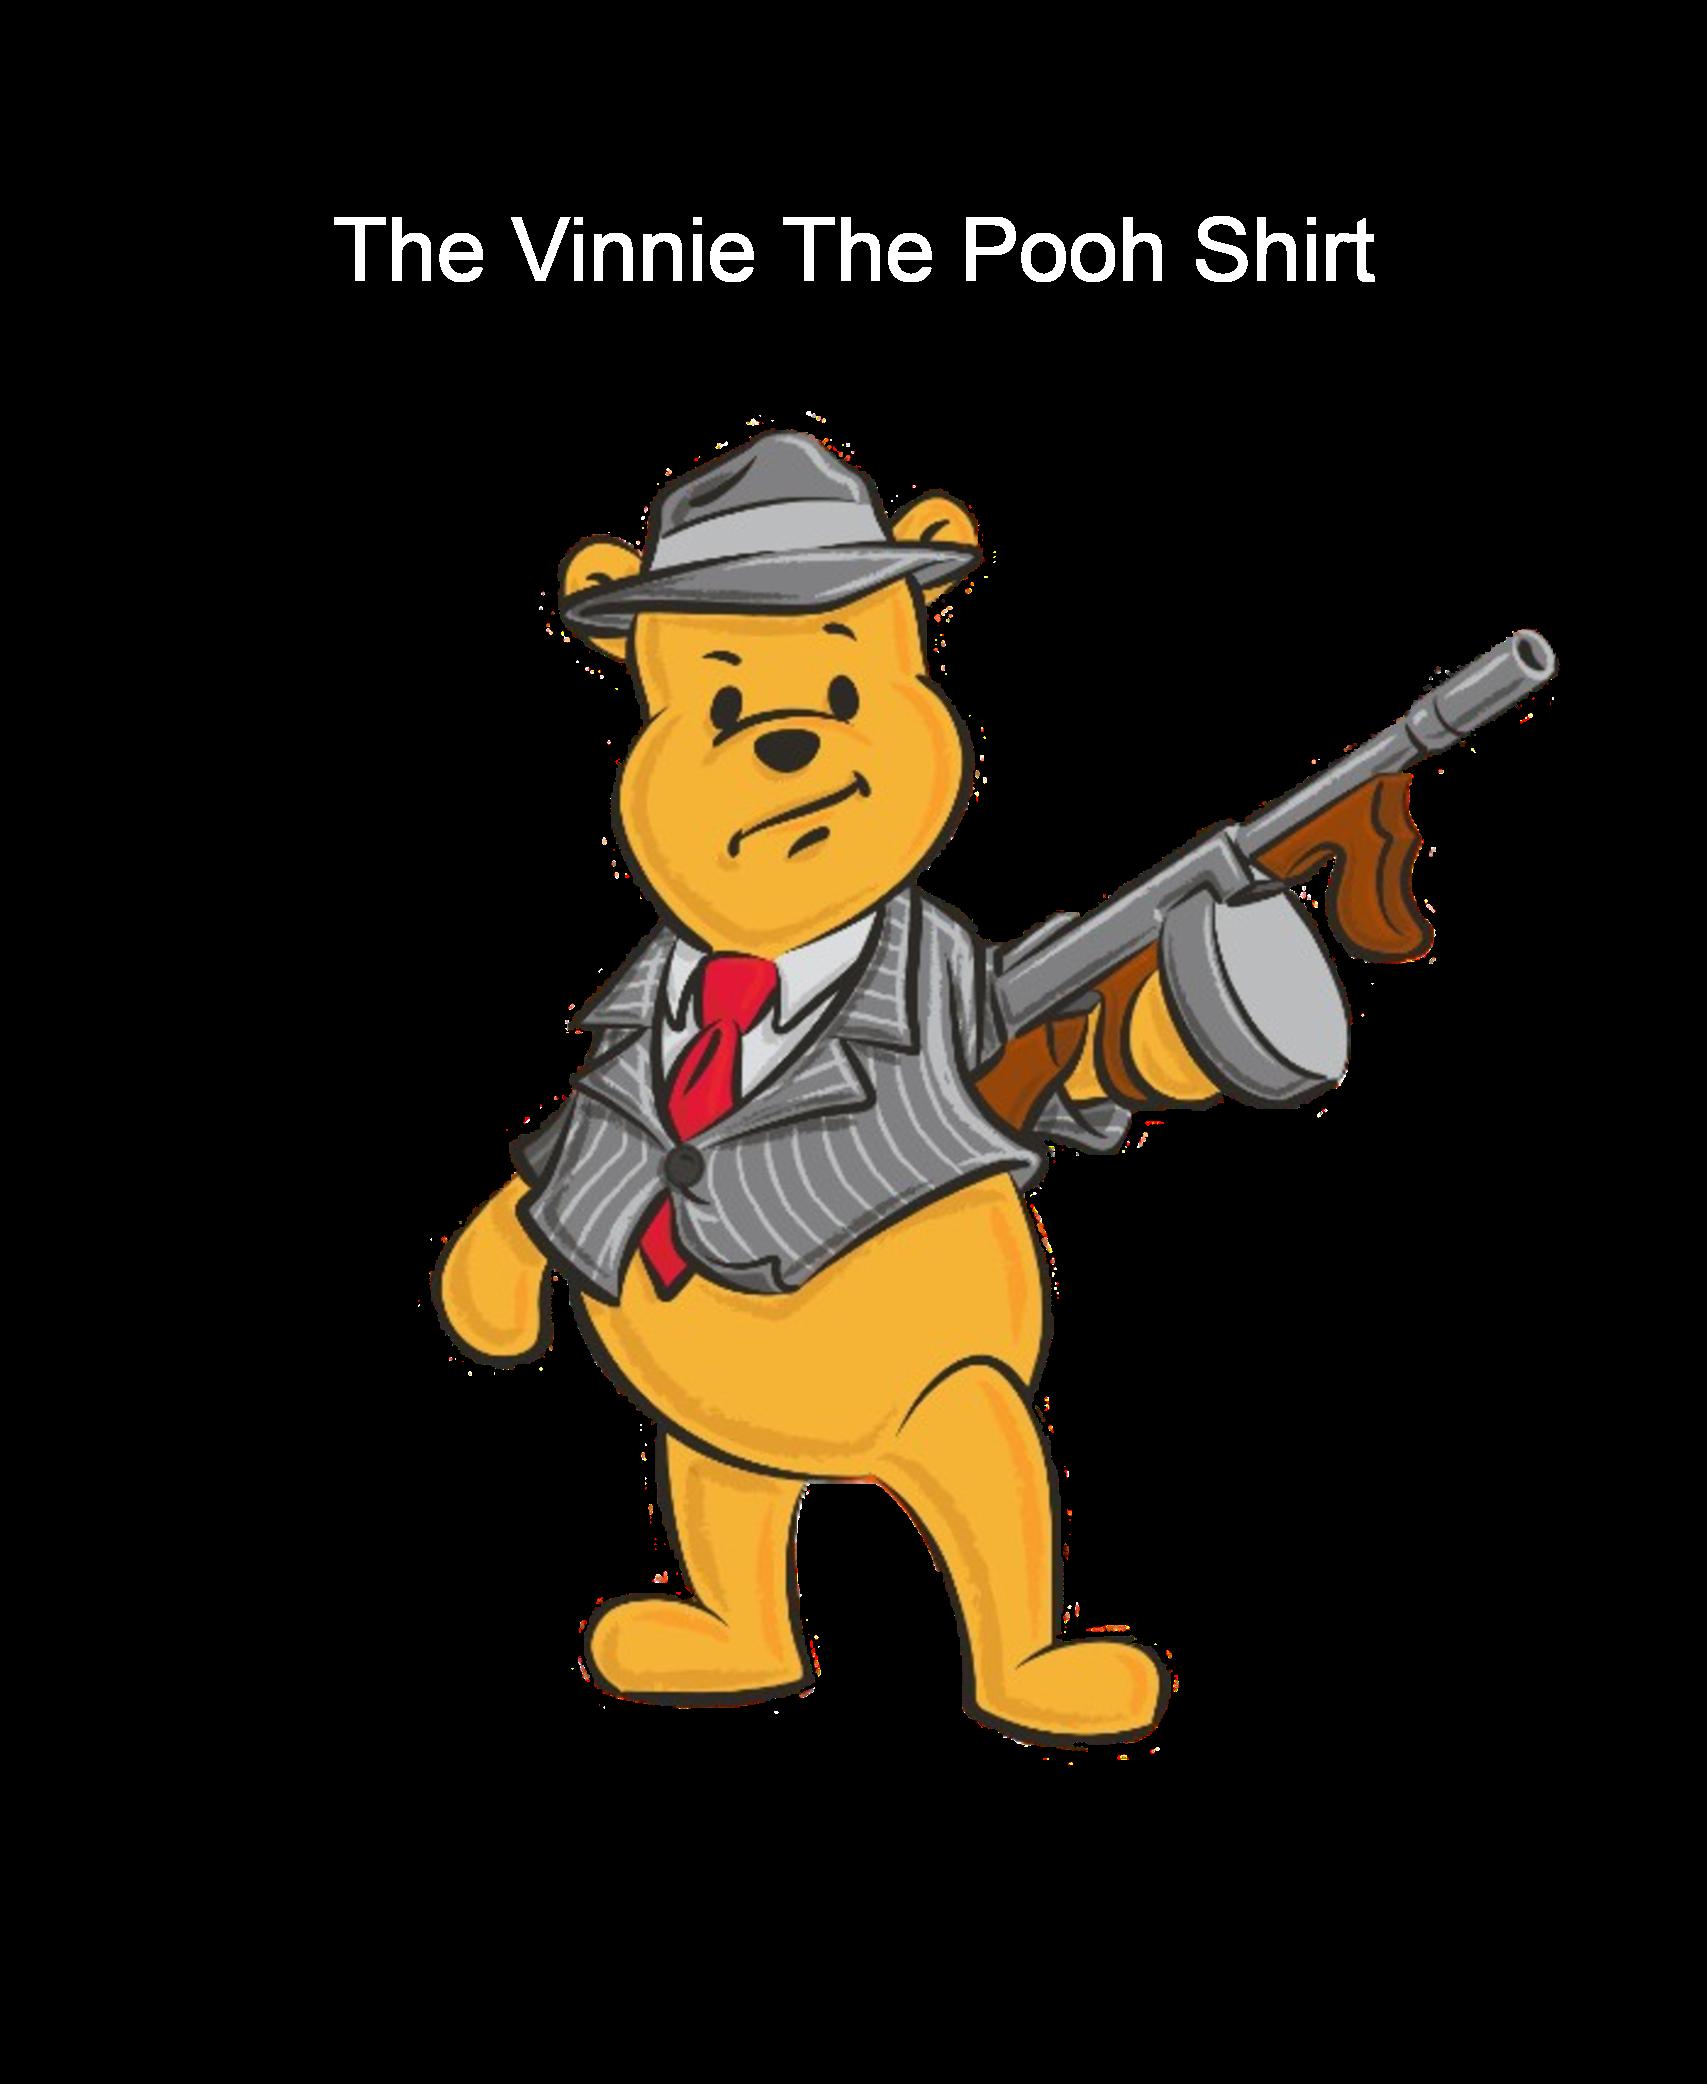 Vinnie The Pooh Shirt